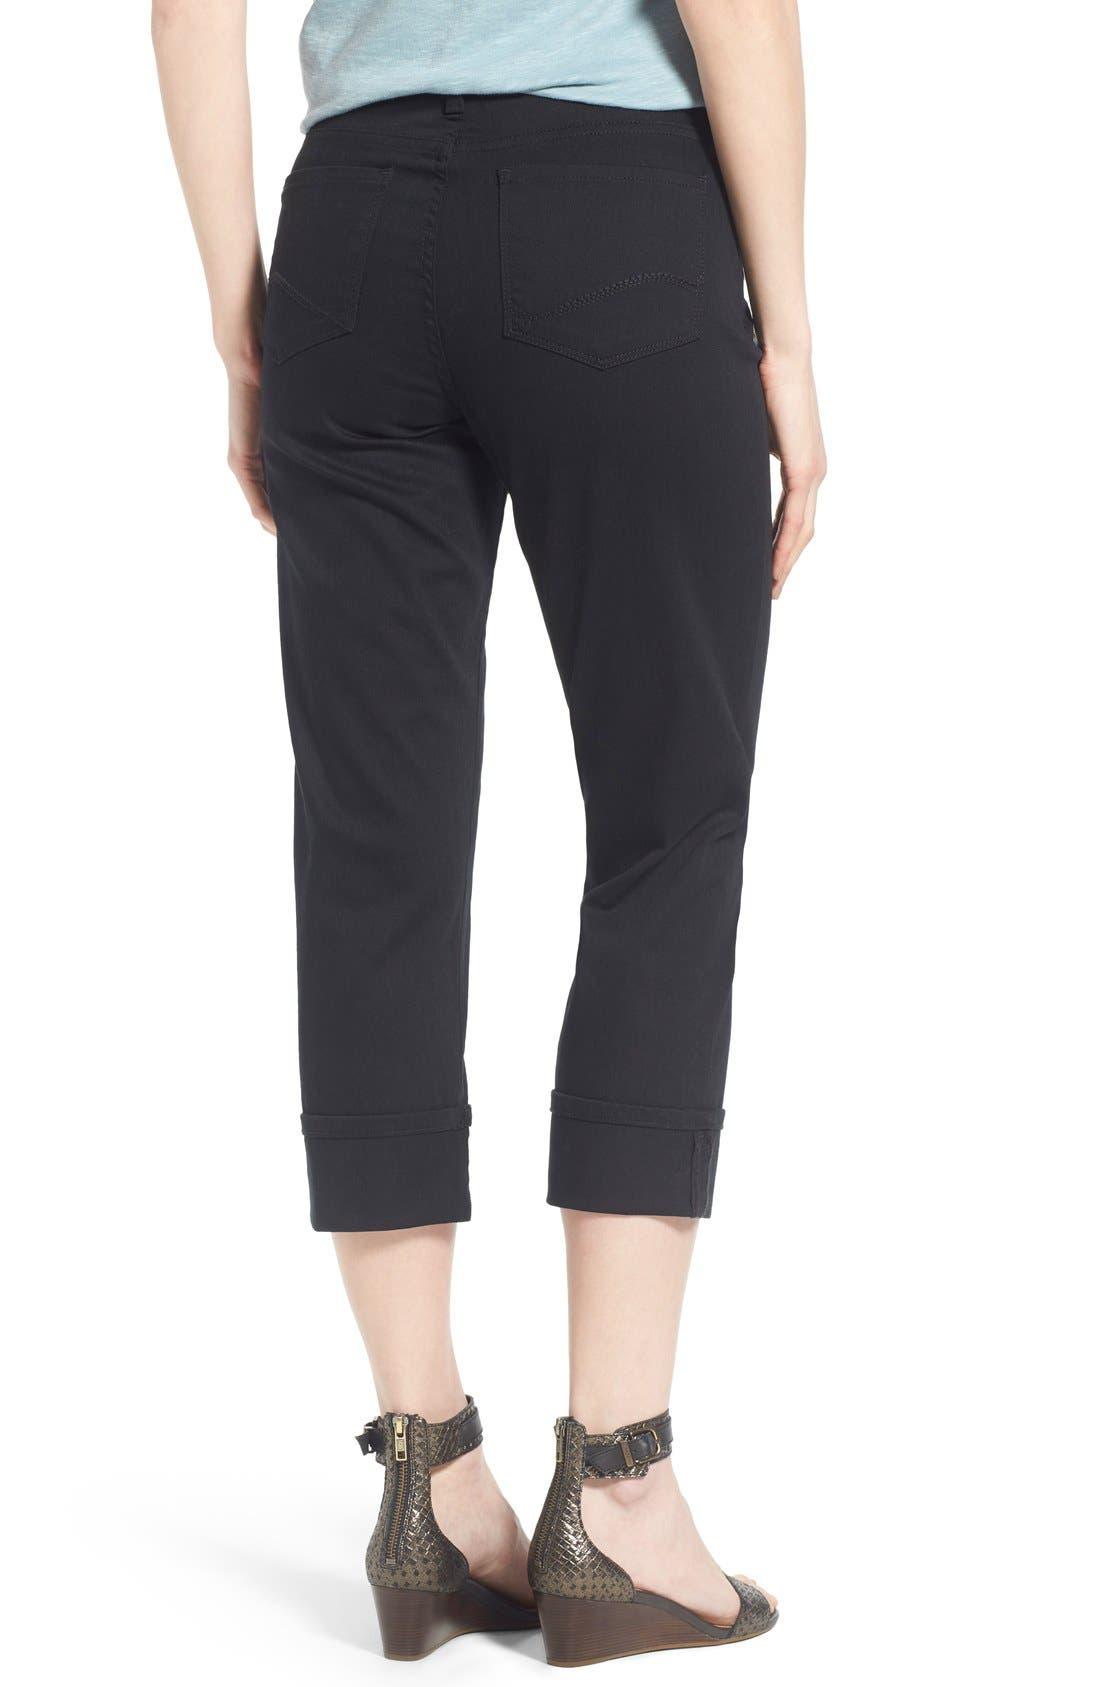 'Dayla' Colored Wide Cuff Capri Jeans,                             Alternate thumbnail 2, color,                             001